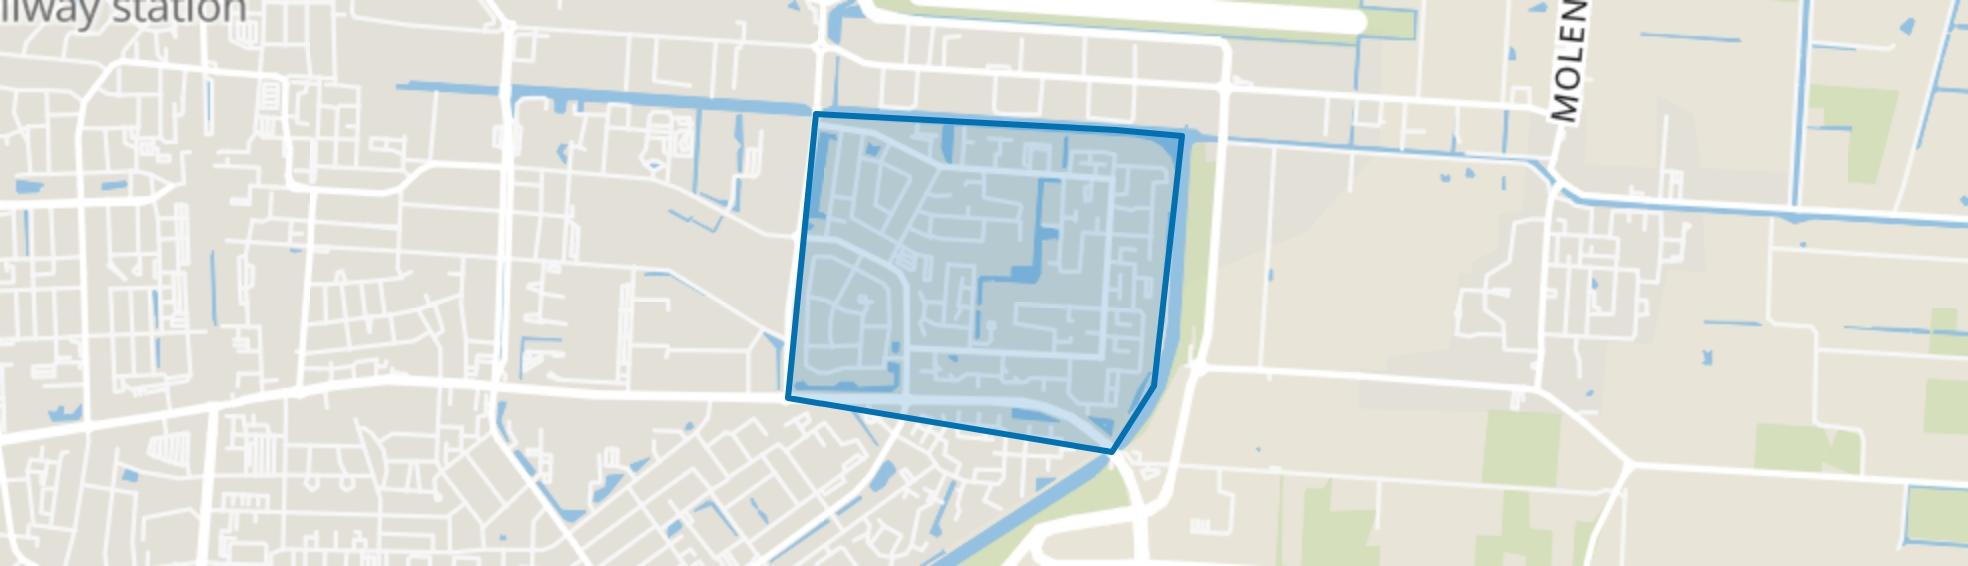 Krakeel, Hoogeveen map